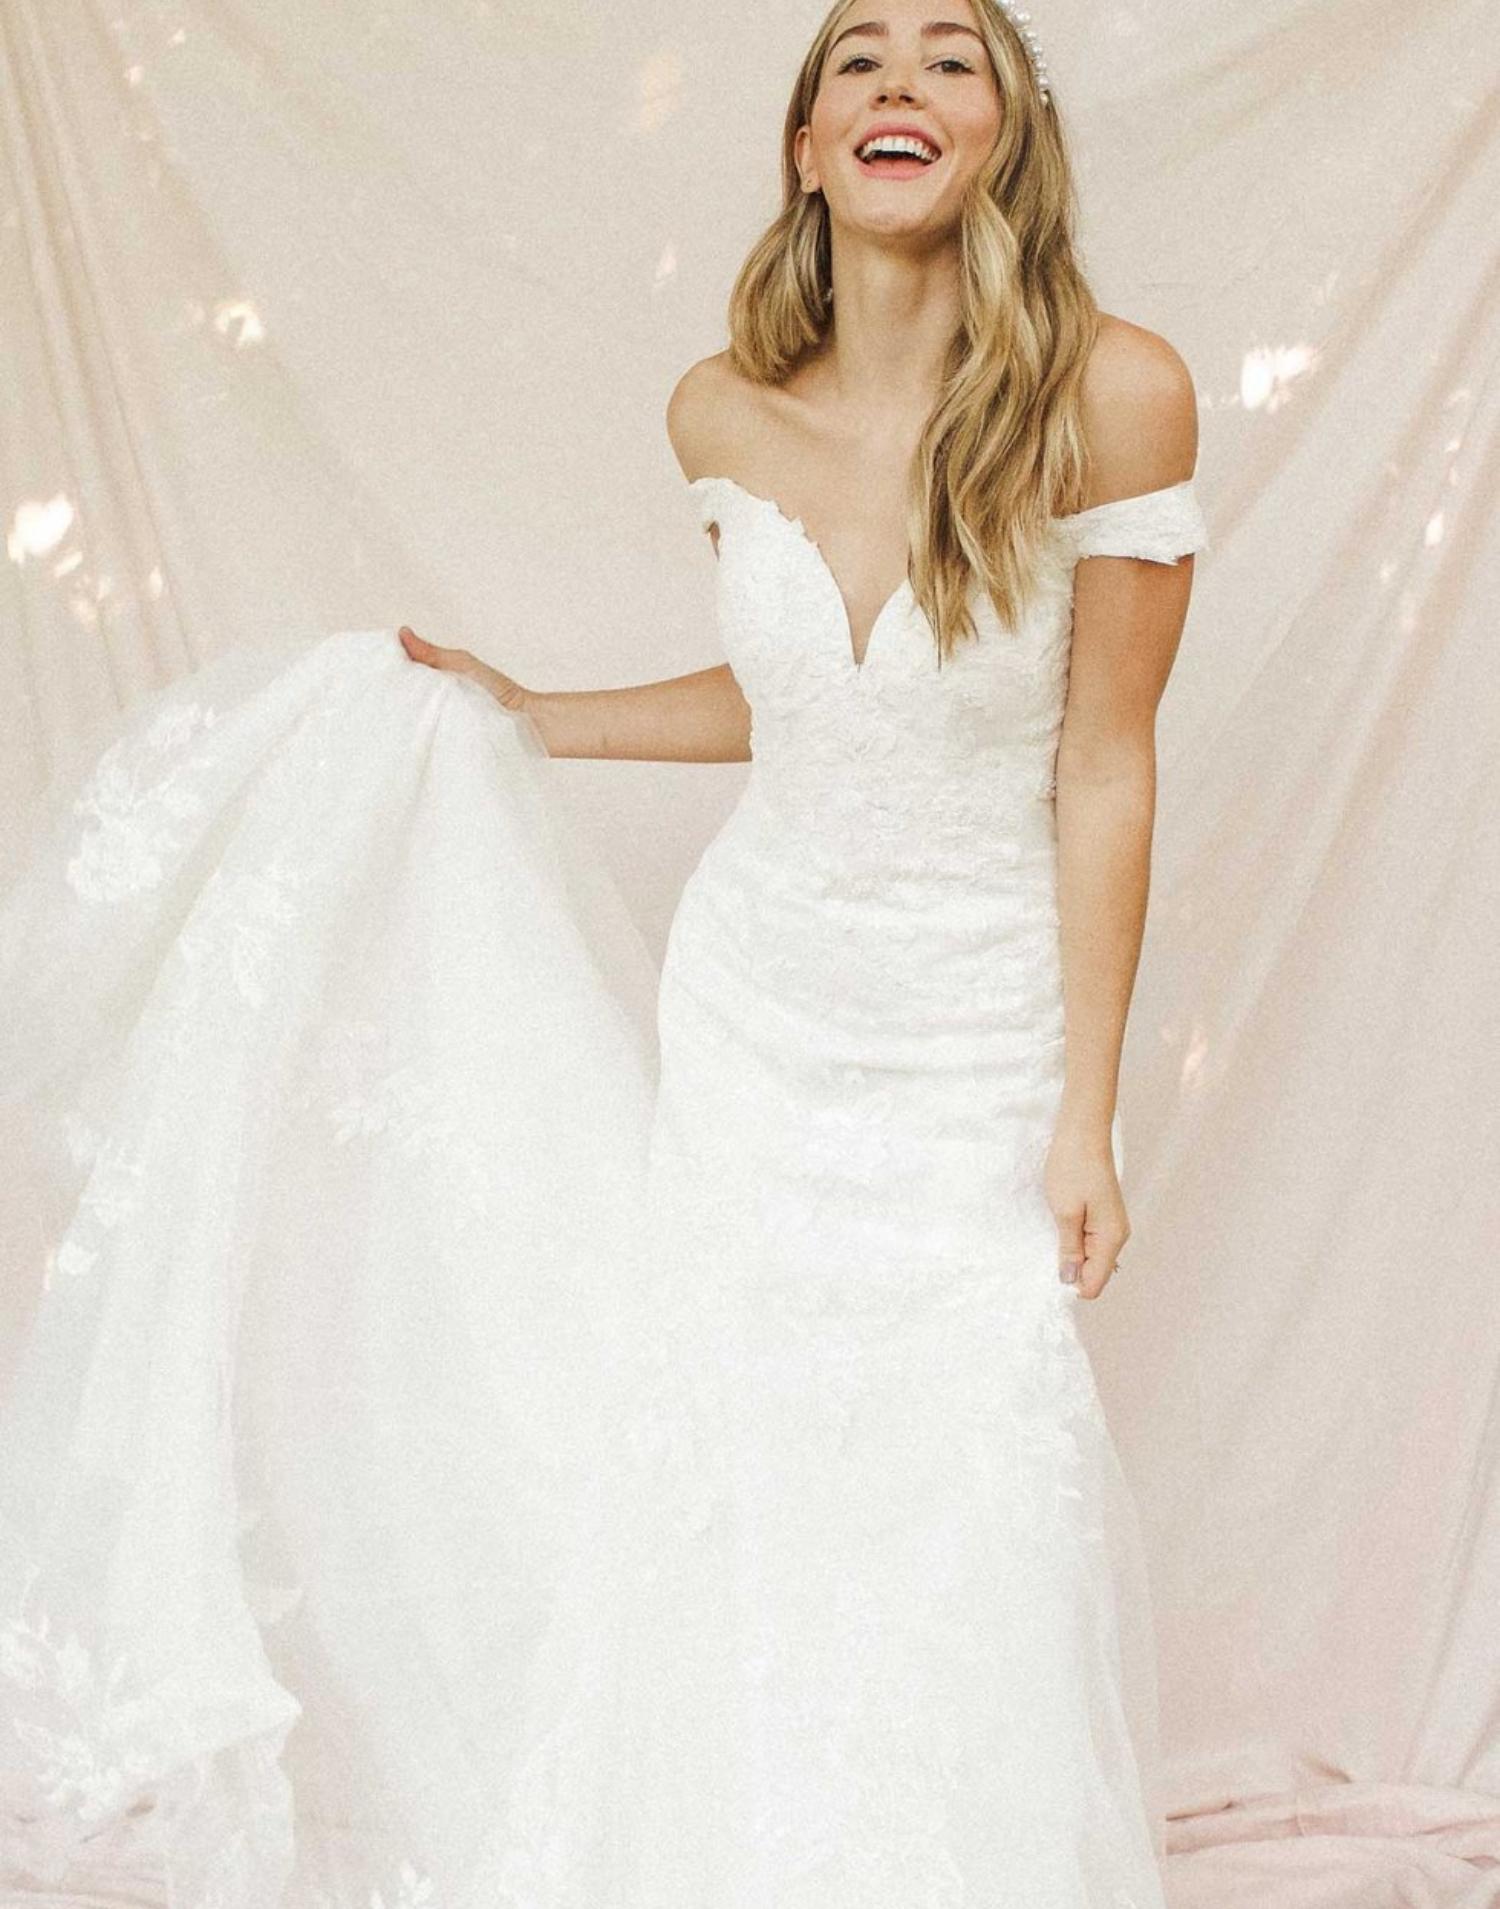 7266-wedding-dress-Stella-York-front-view-min